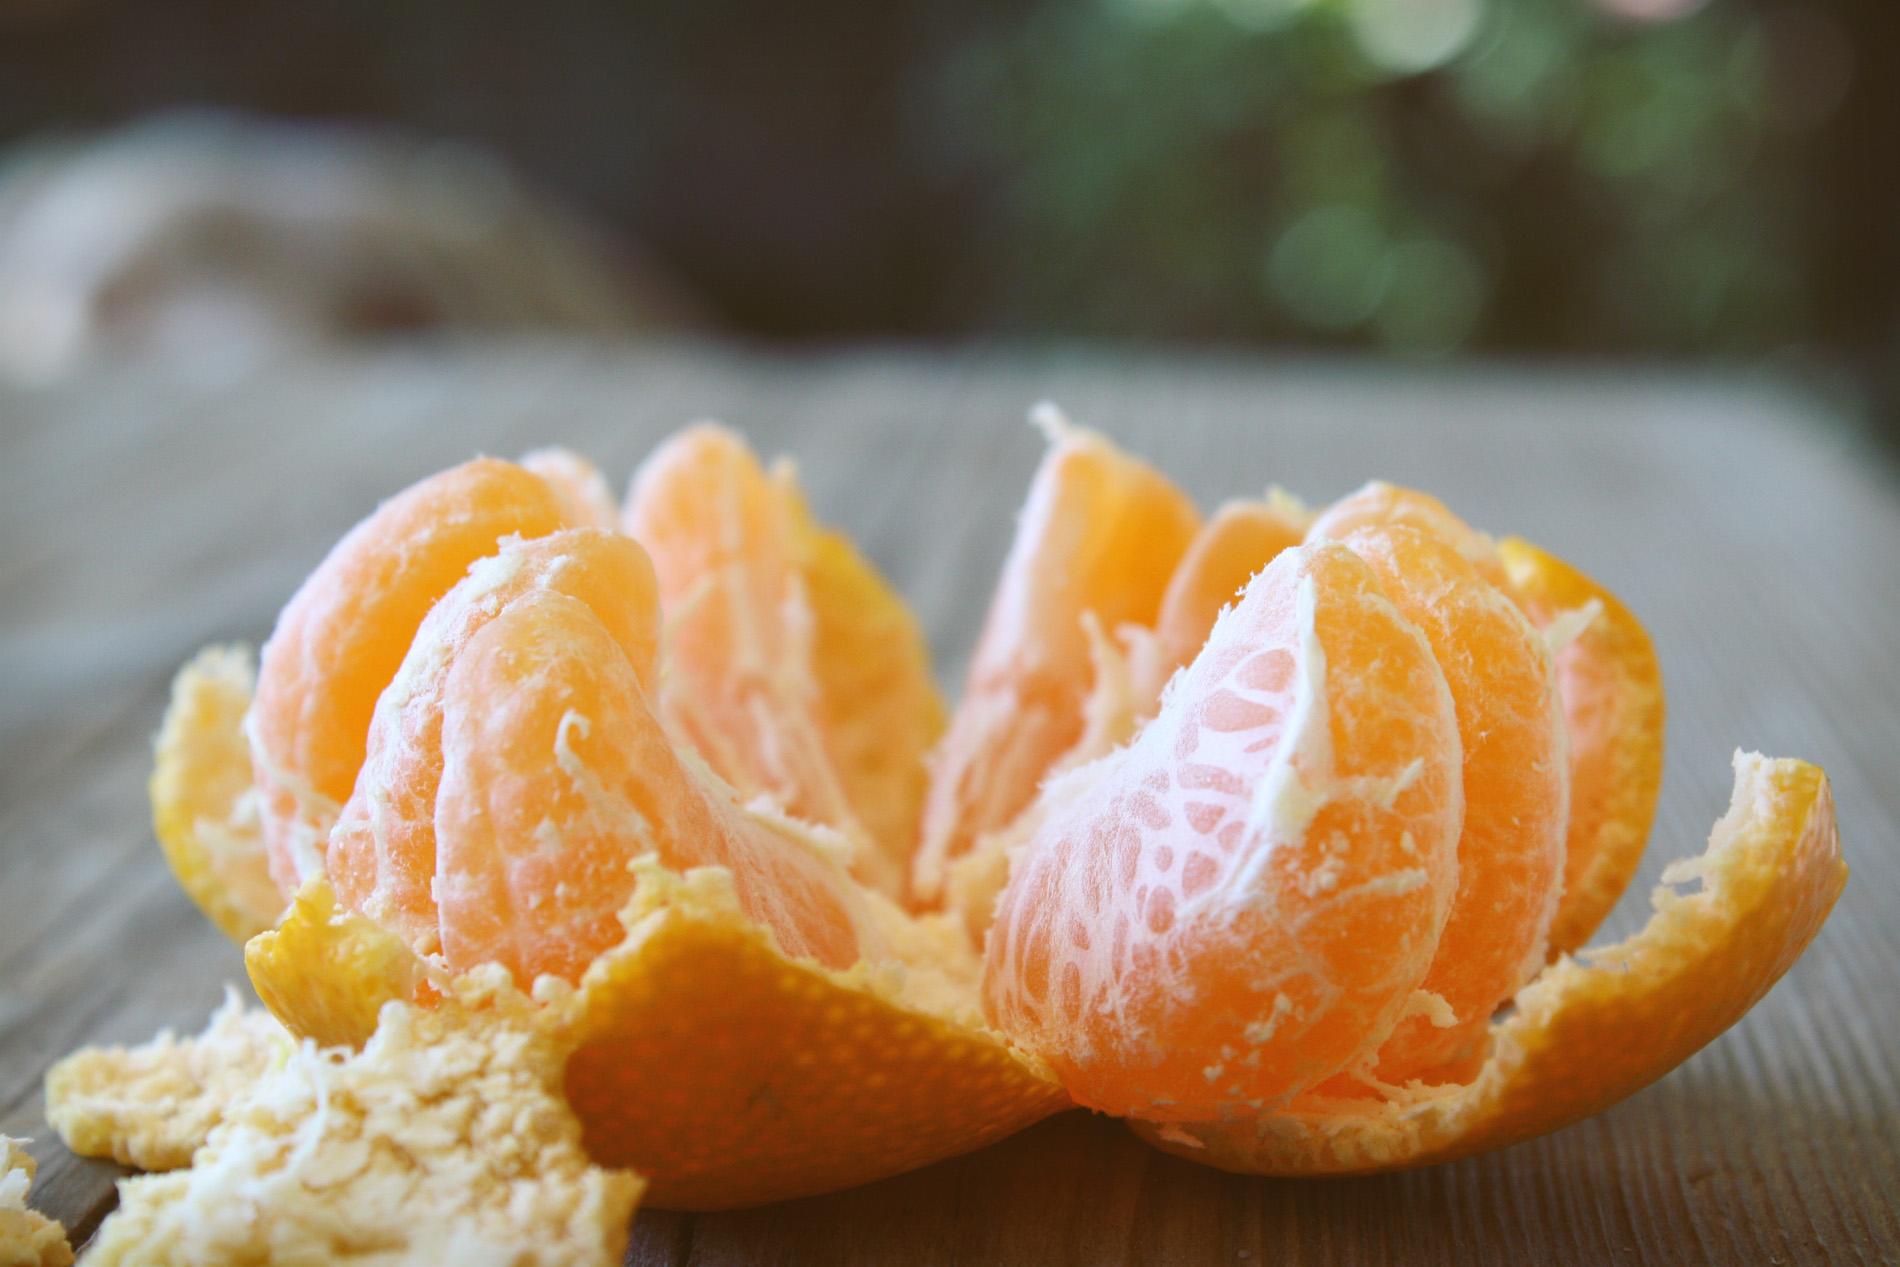 tangerine 37525